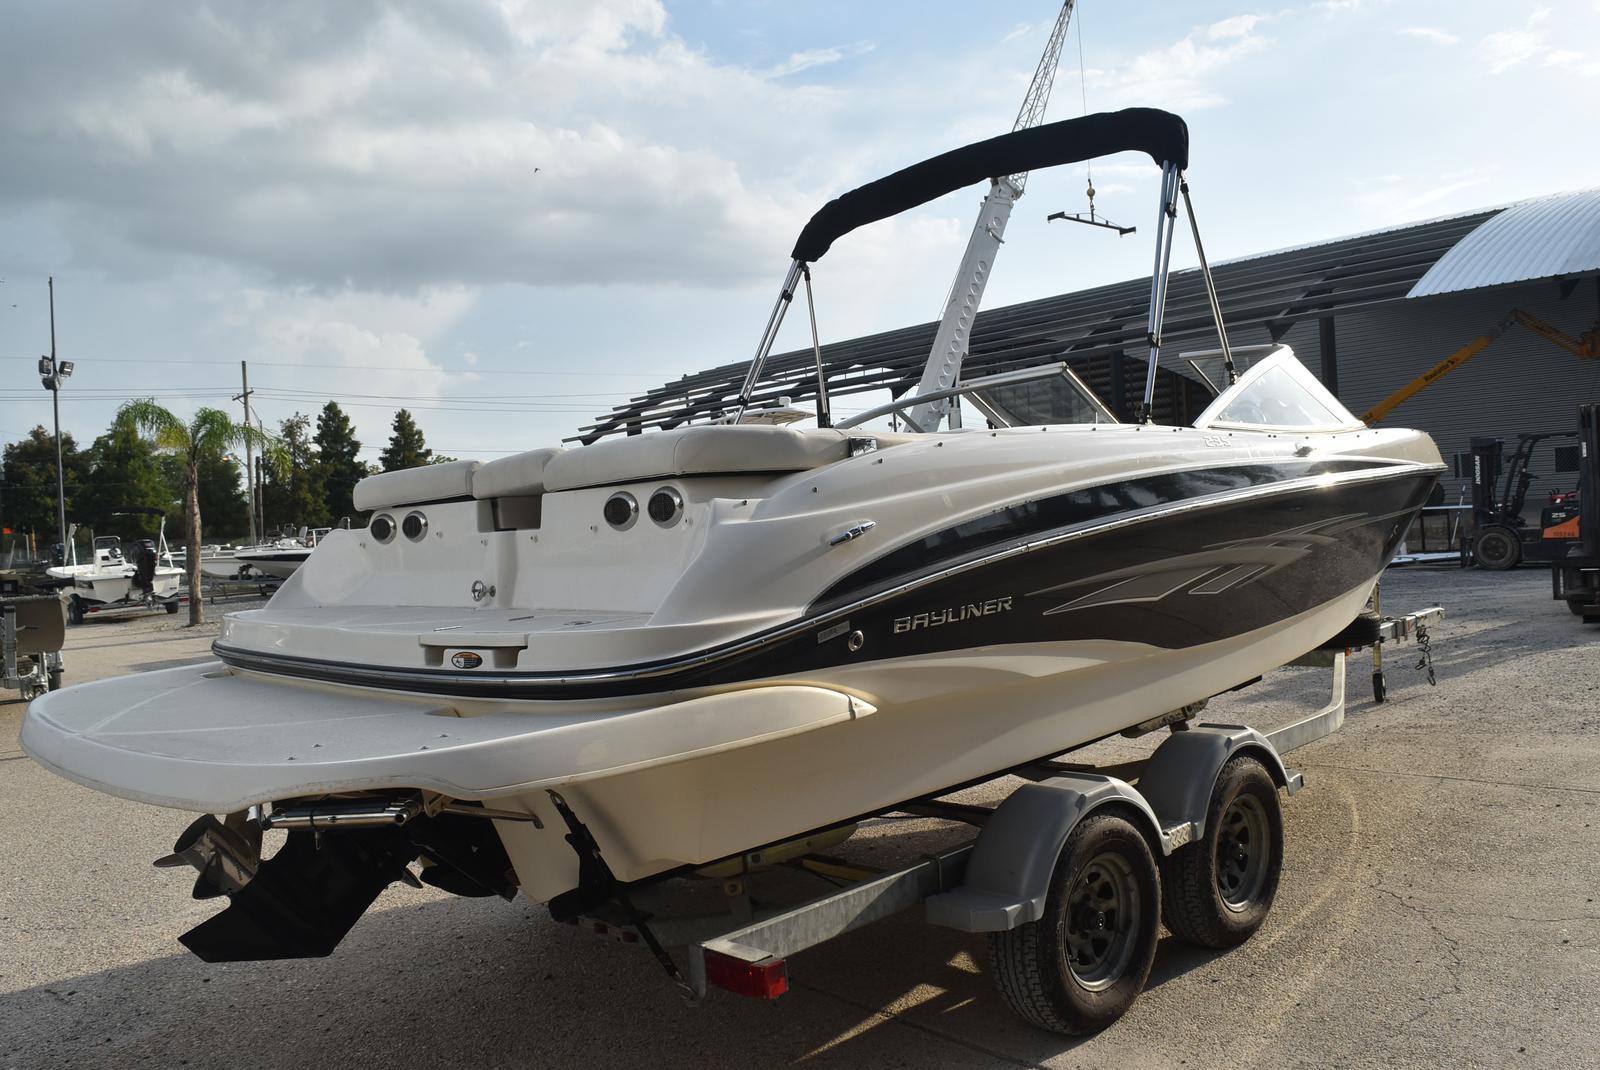 2010 Bayliner boat for sale, model of the boat is 235BR & Image # 22 of 43